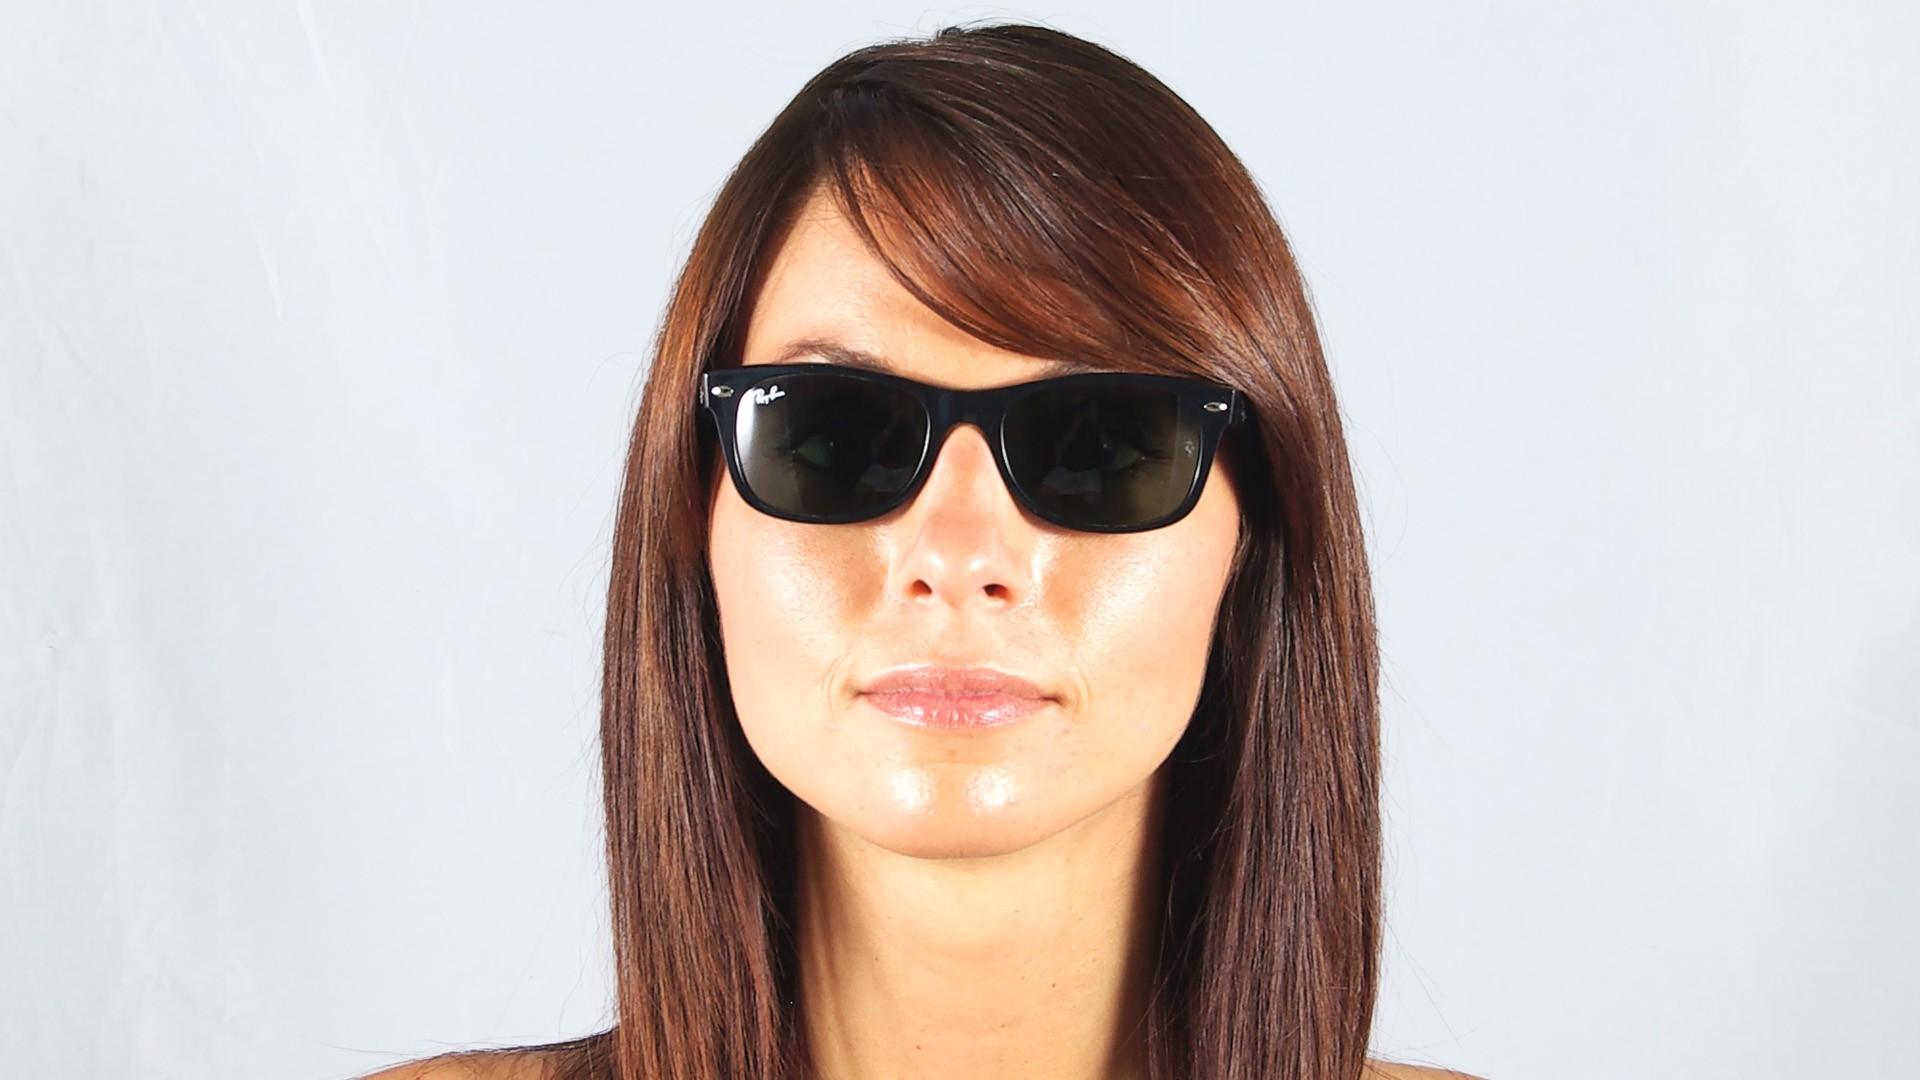 5fb03caf9 Sunglasses Ray-Ban New Wayfarer Black RB2132 901 52-18 Small